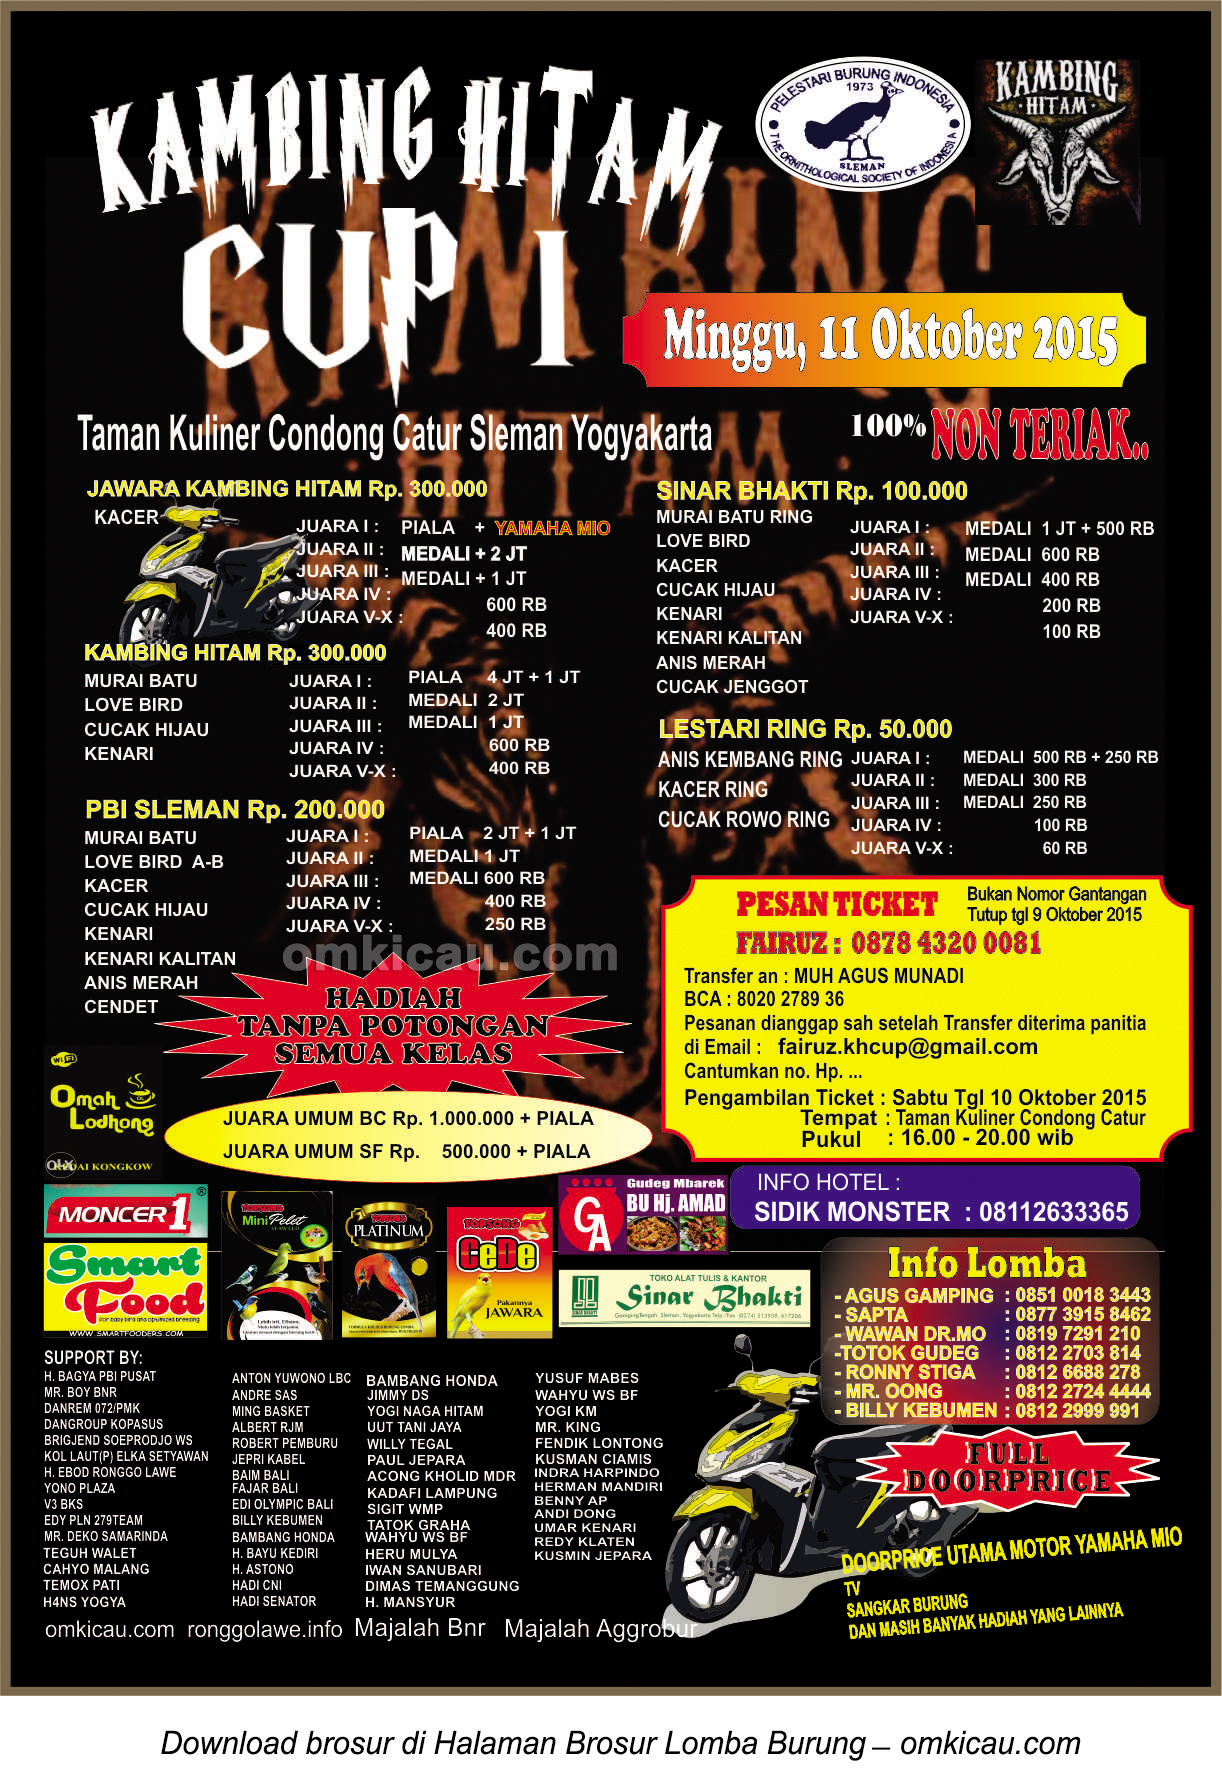 Brosur Lomba Burung Berkicau Kambing Hitam Cup, Jogja, 11 Oktober 2015